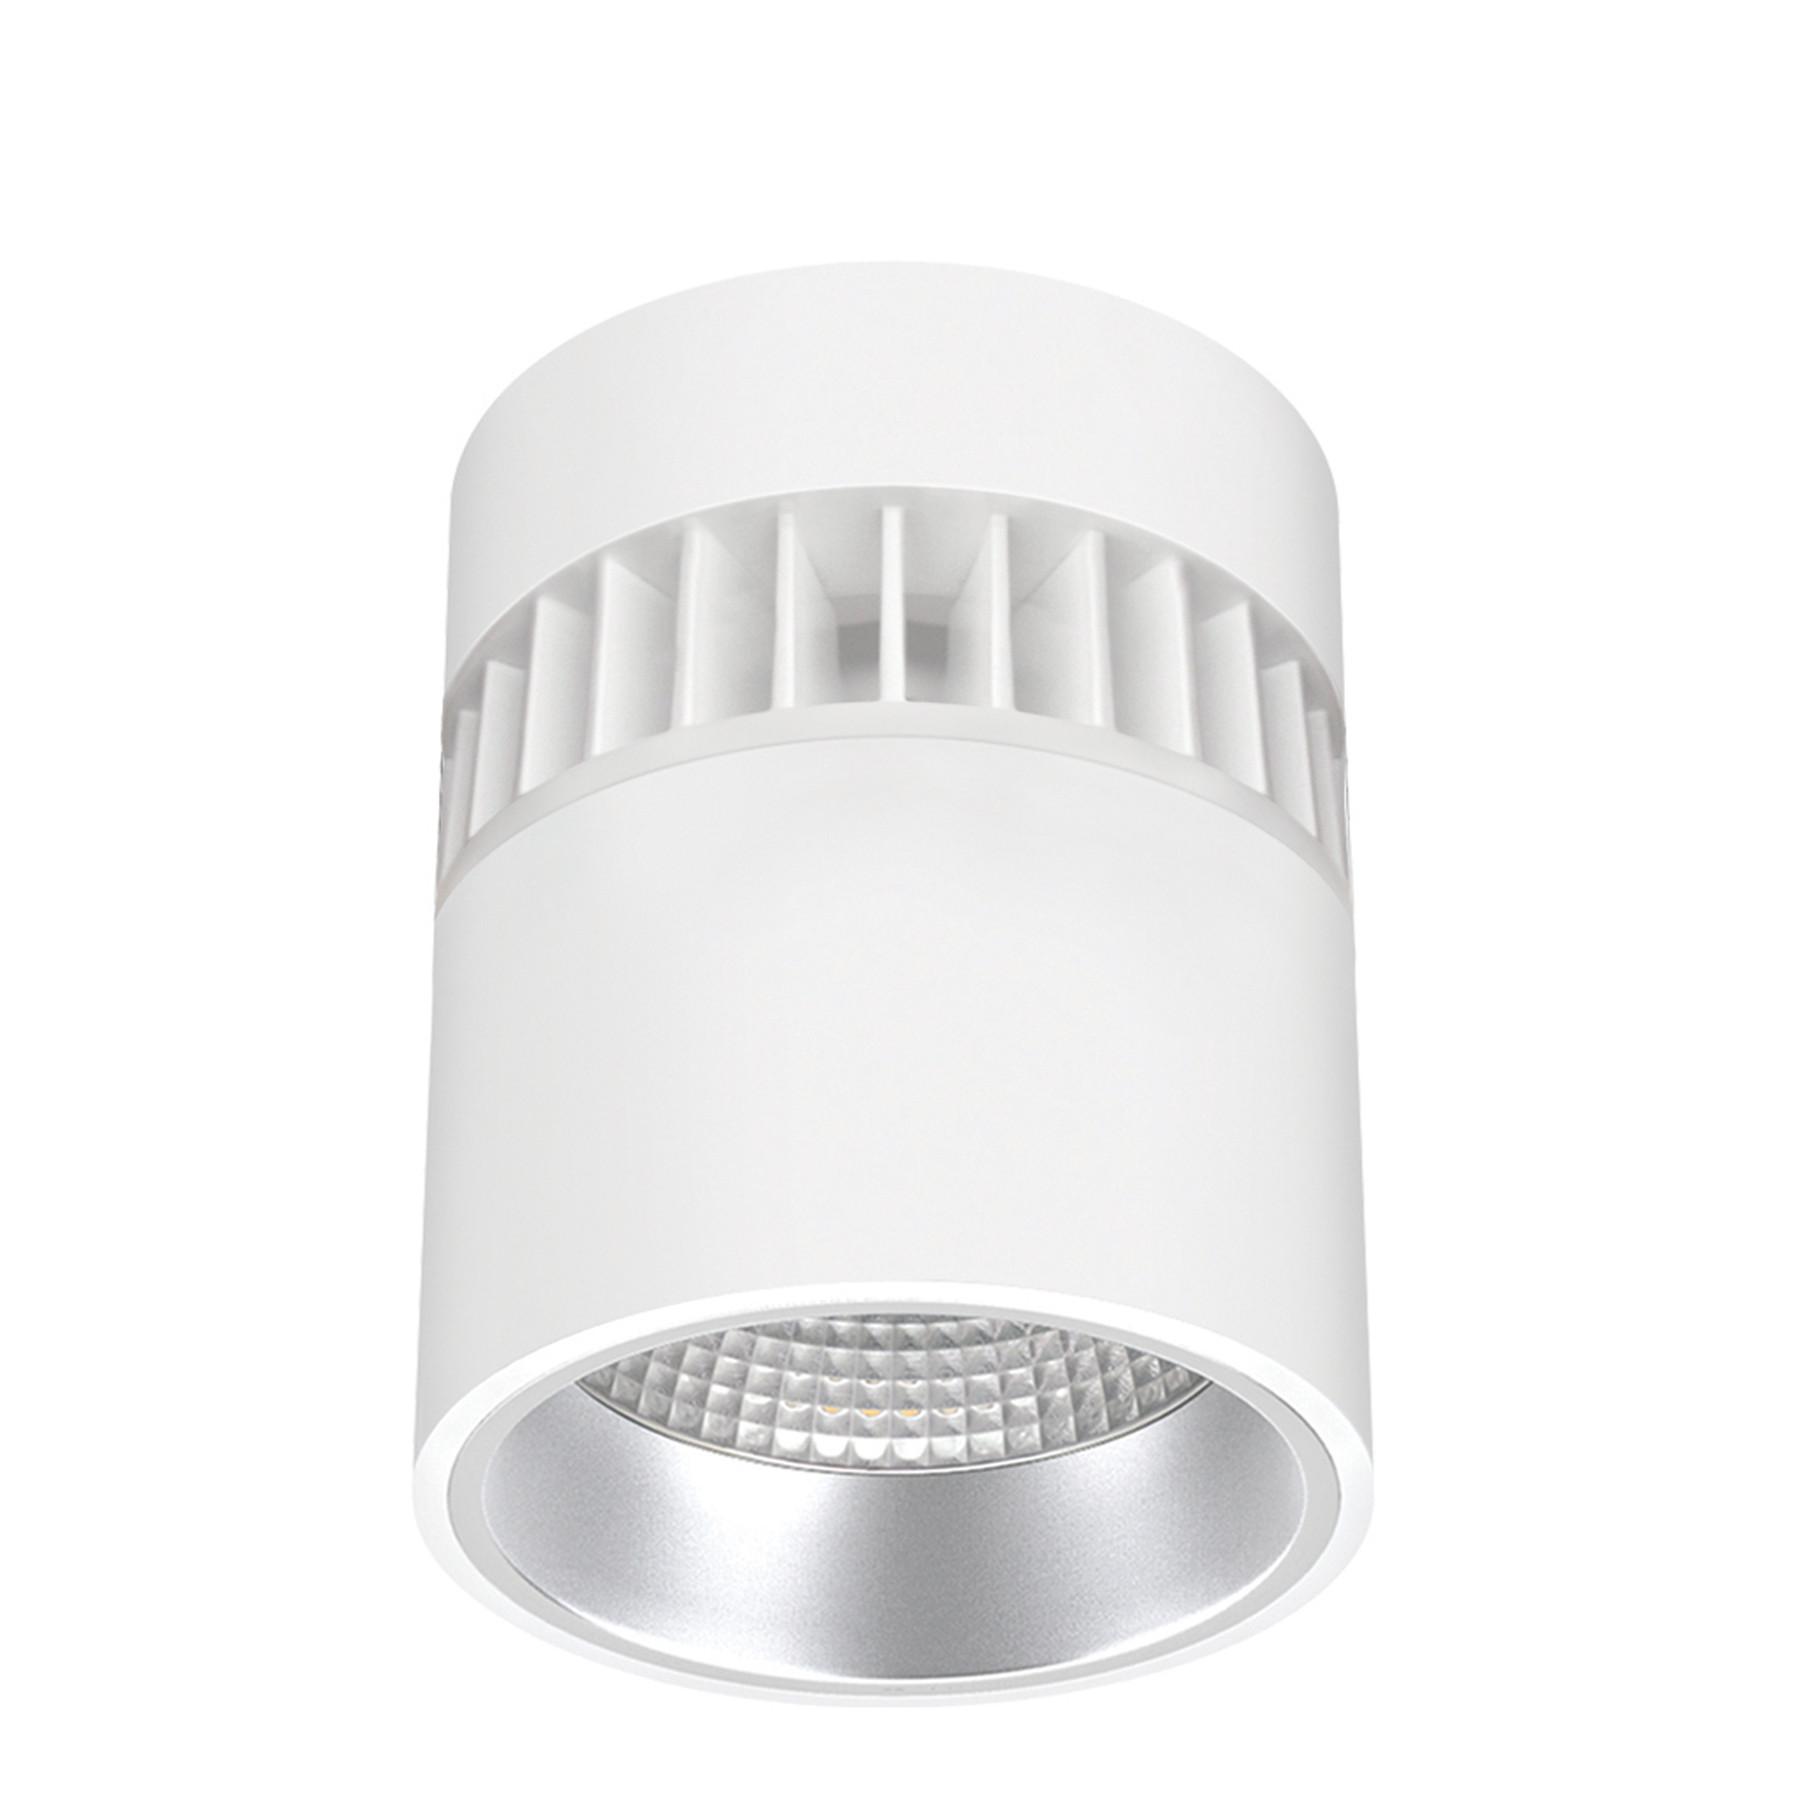 Liton lcald6 6 pendantceiling mount lumen cannon 1000 6000lm downloads aloadofball Image collections